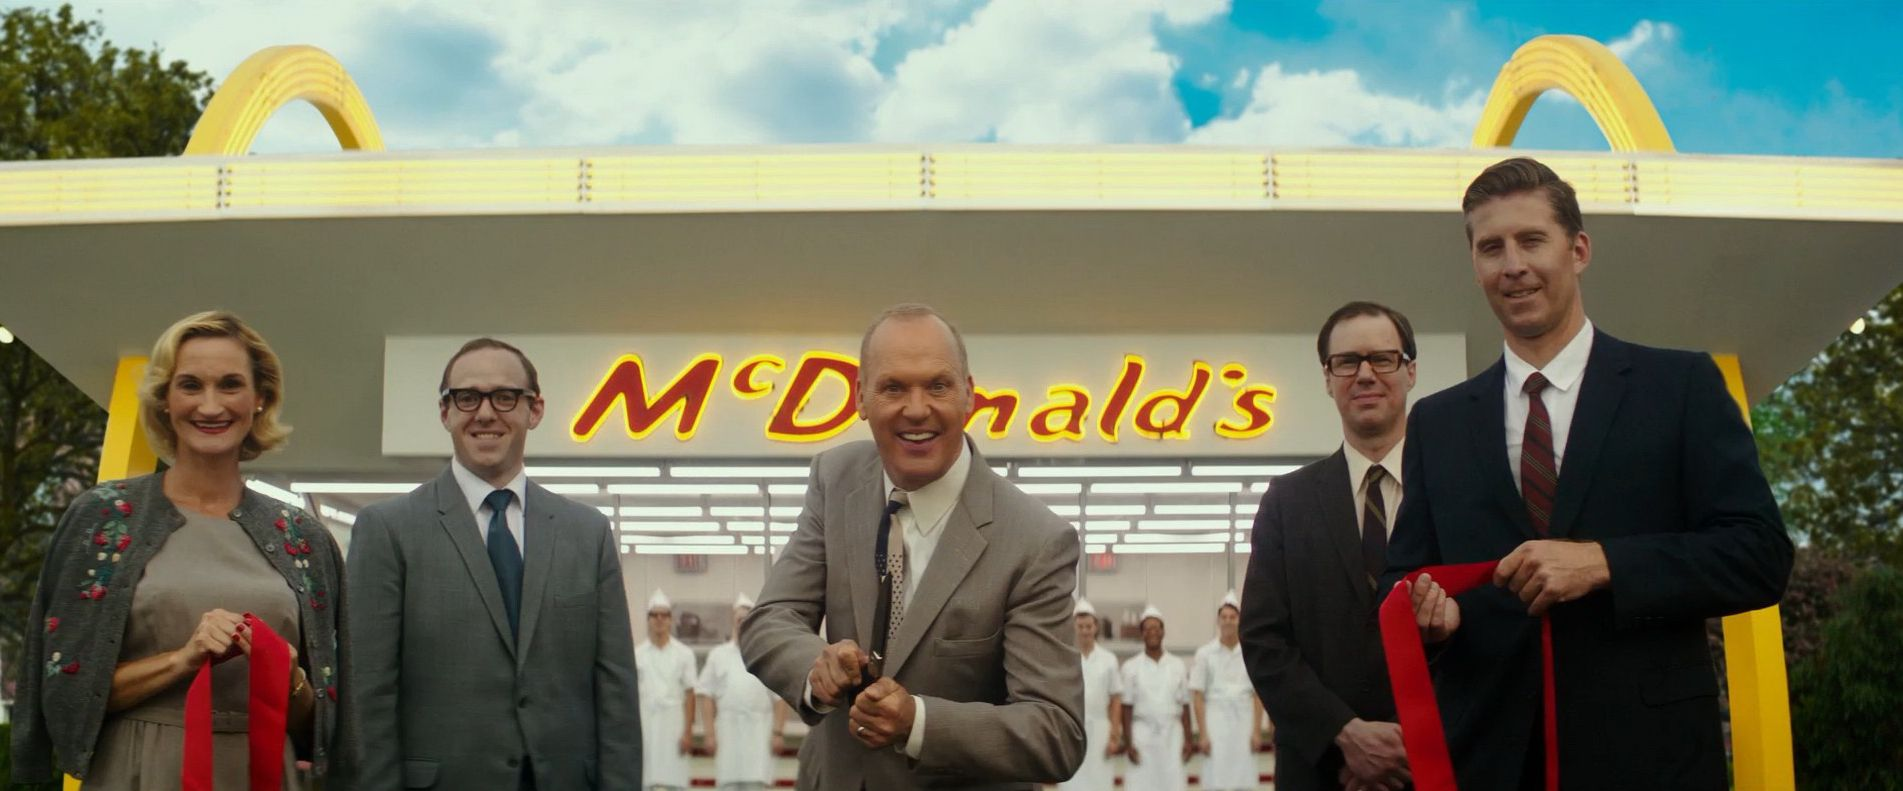 Michael Keaton - The Founder